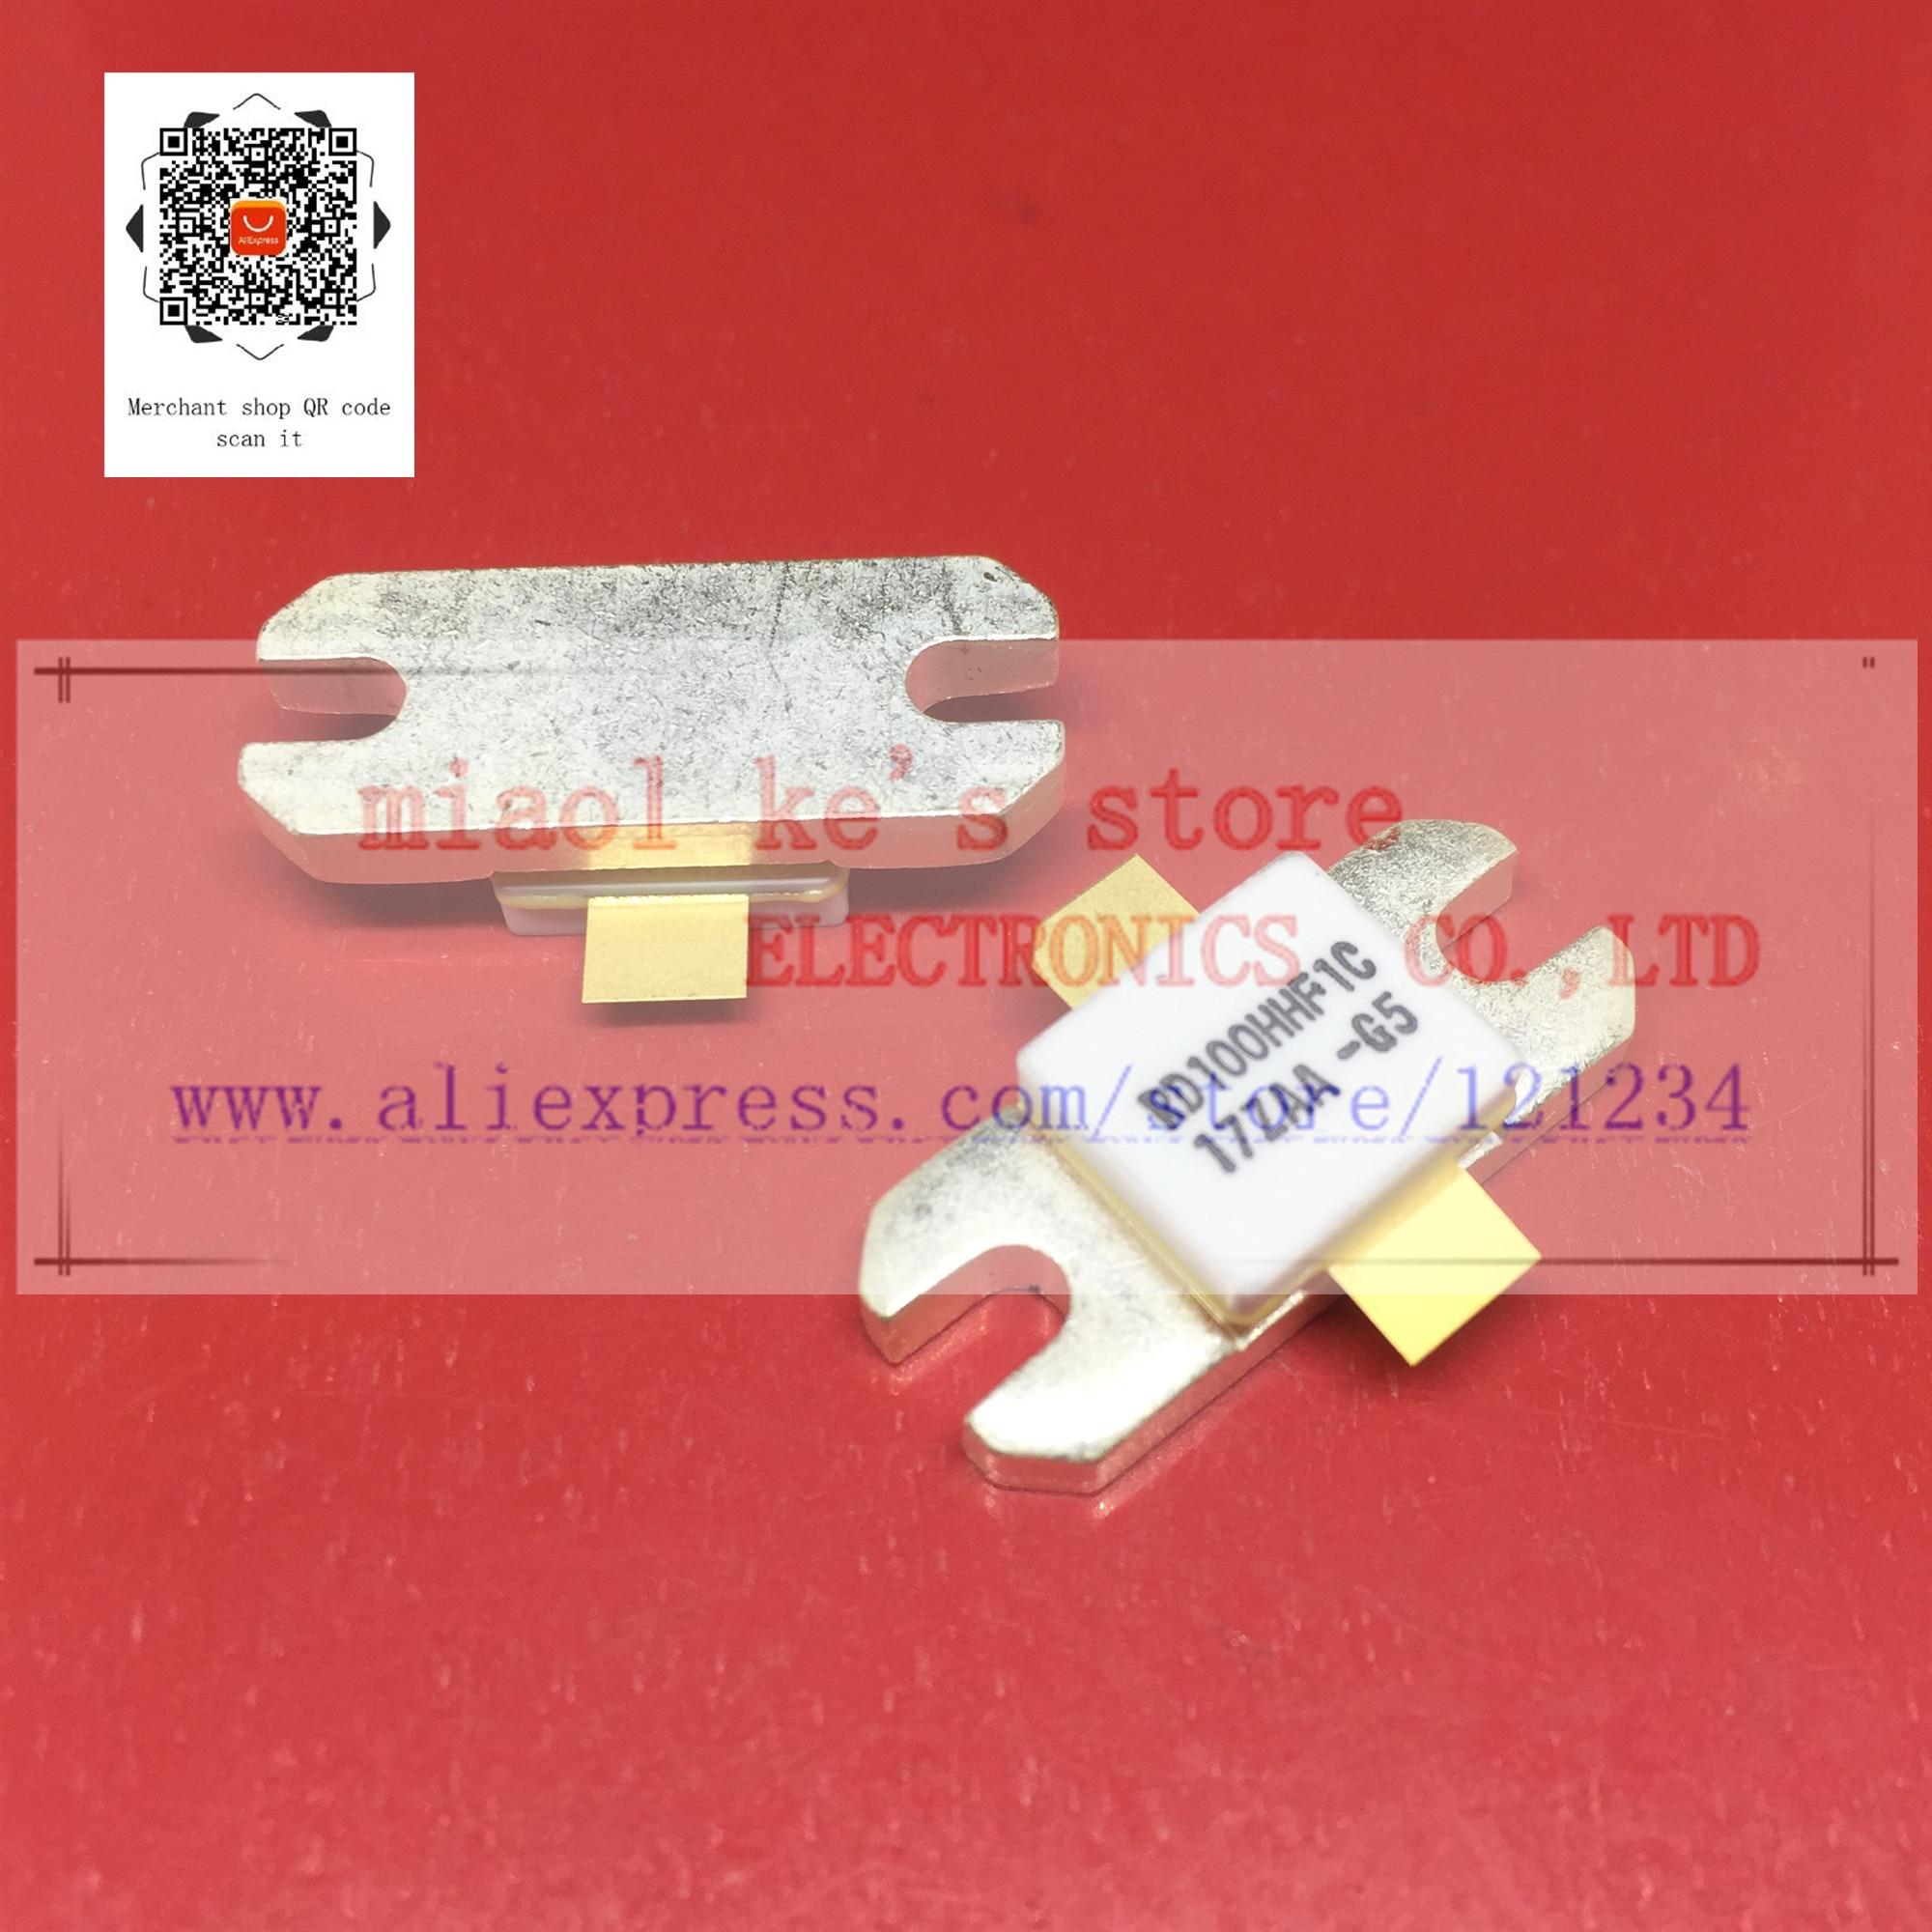 Giá bán 100100hhf1 - 100%New original; RD100HHF1  RD100HHF1C  RD100HHF1-101 RD100HHF1C-501 - Silicon MOSFET Power Transistor 30MHz,100W